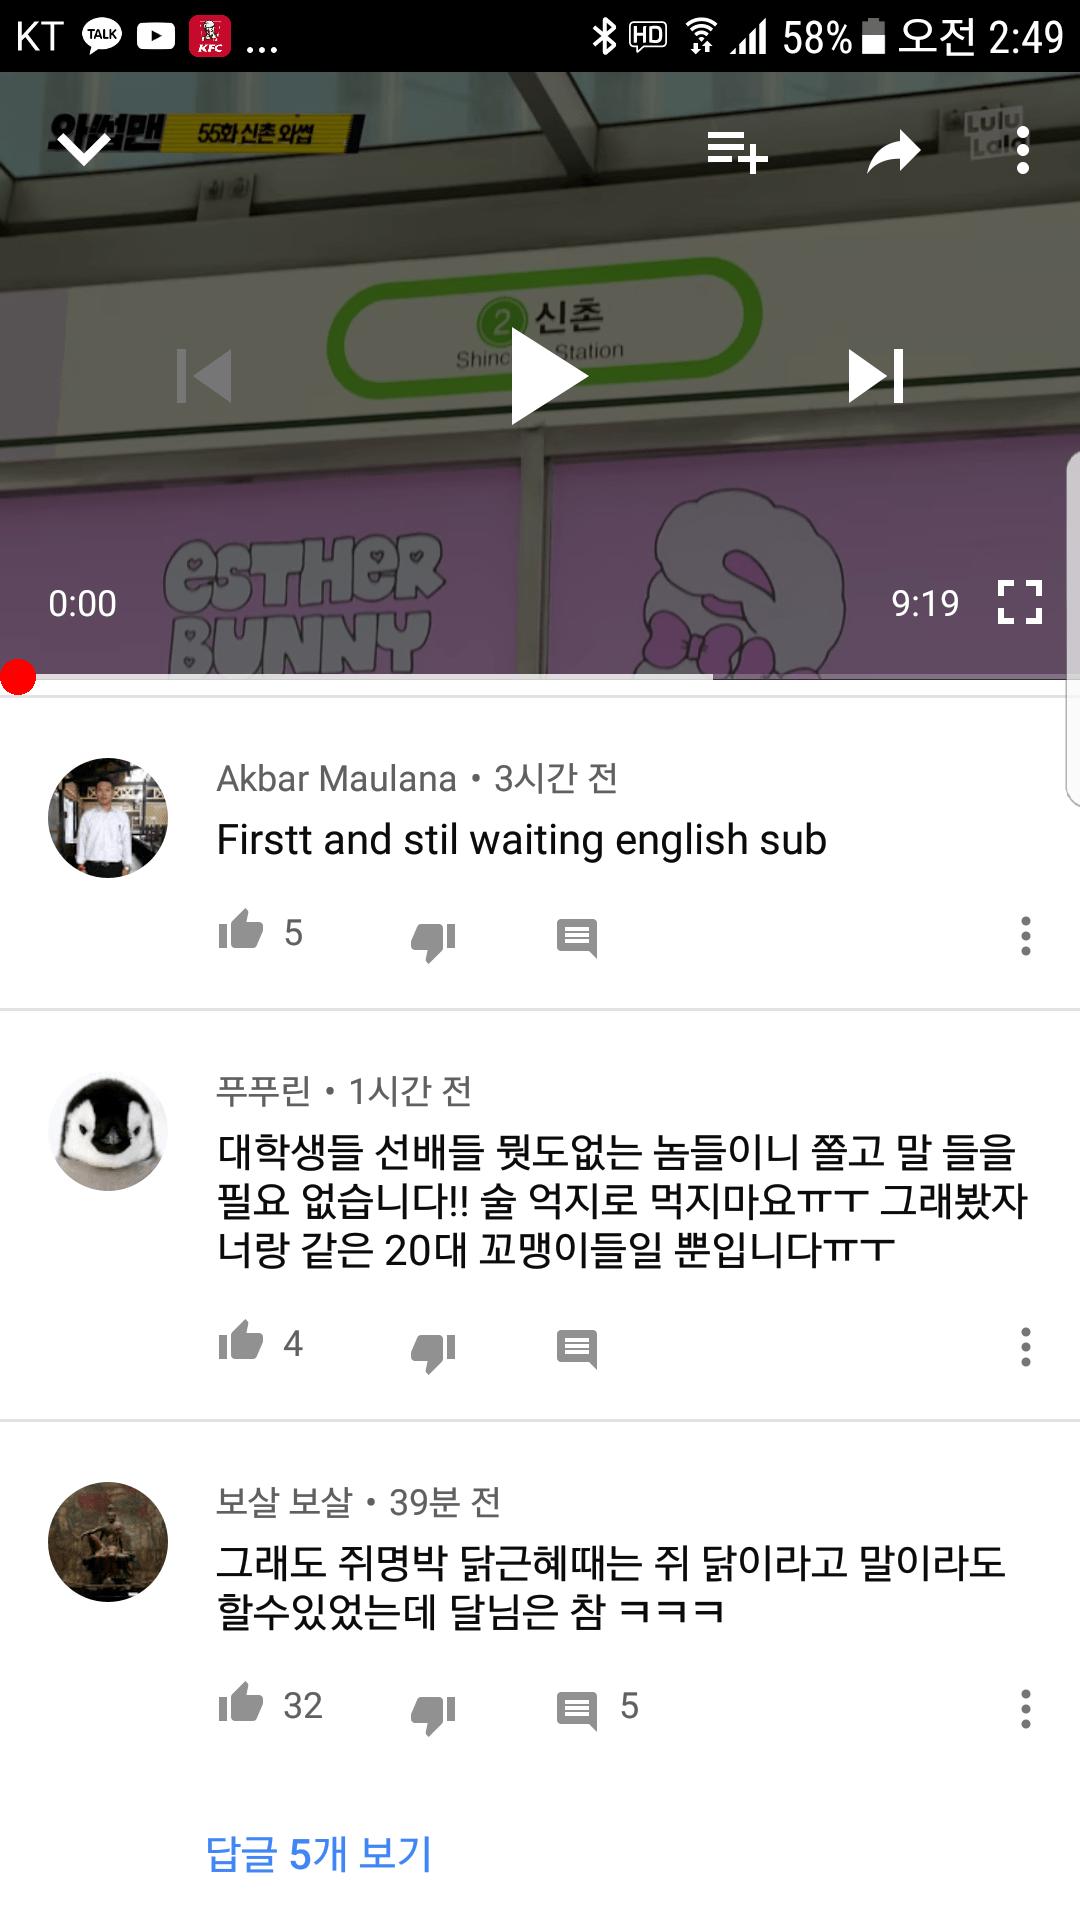 Screenshot_20190316-024942.png 와썹맨 편집수정 댓글현황